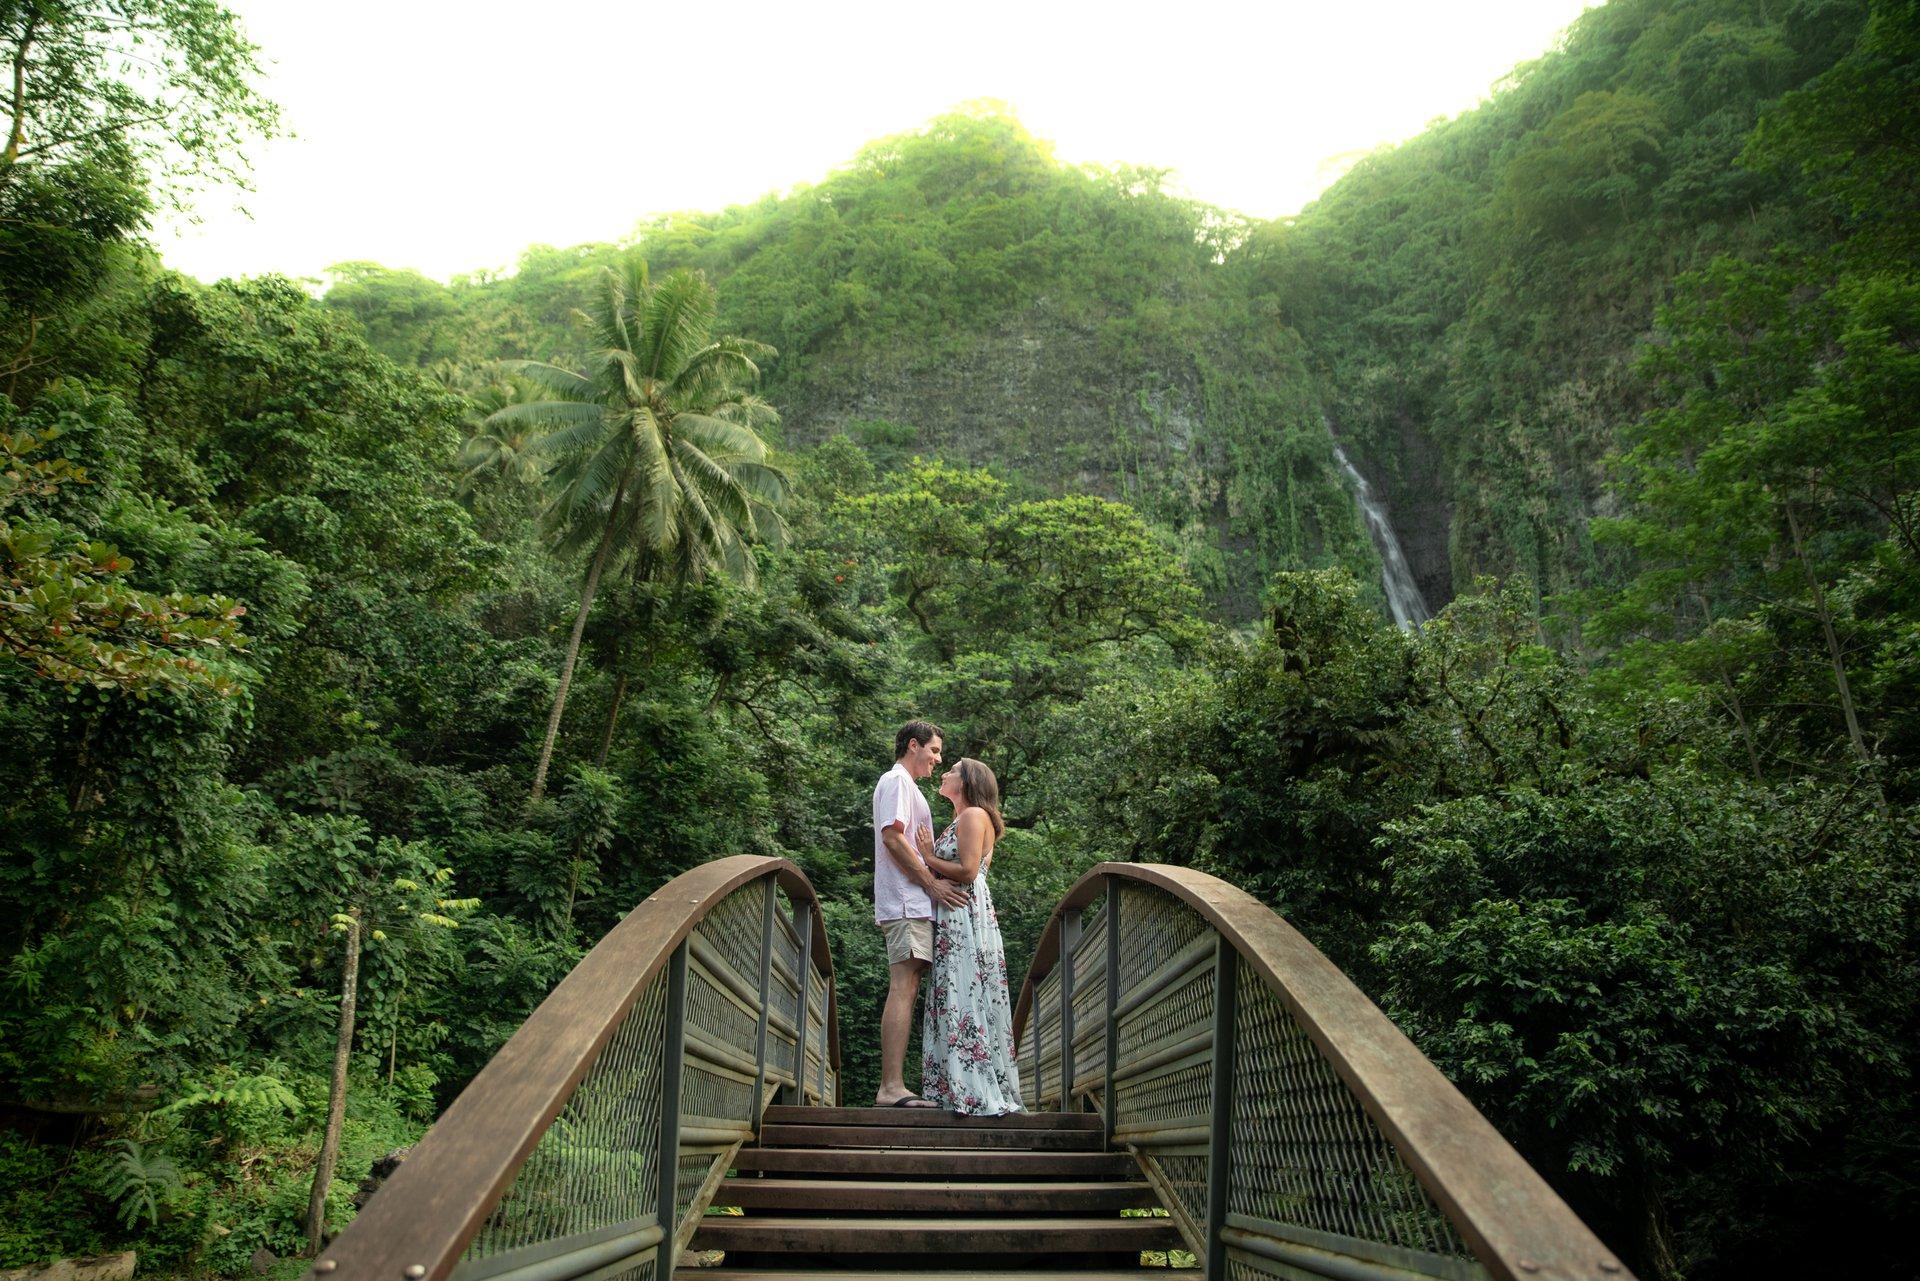 Flytographer Travel Story - Honeymoon in Tahiti